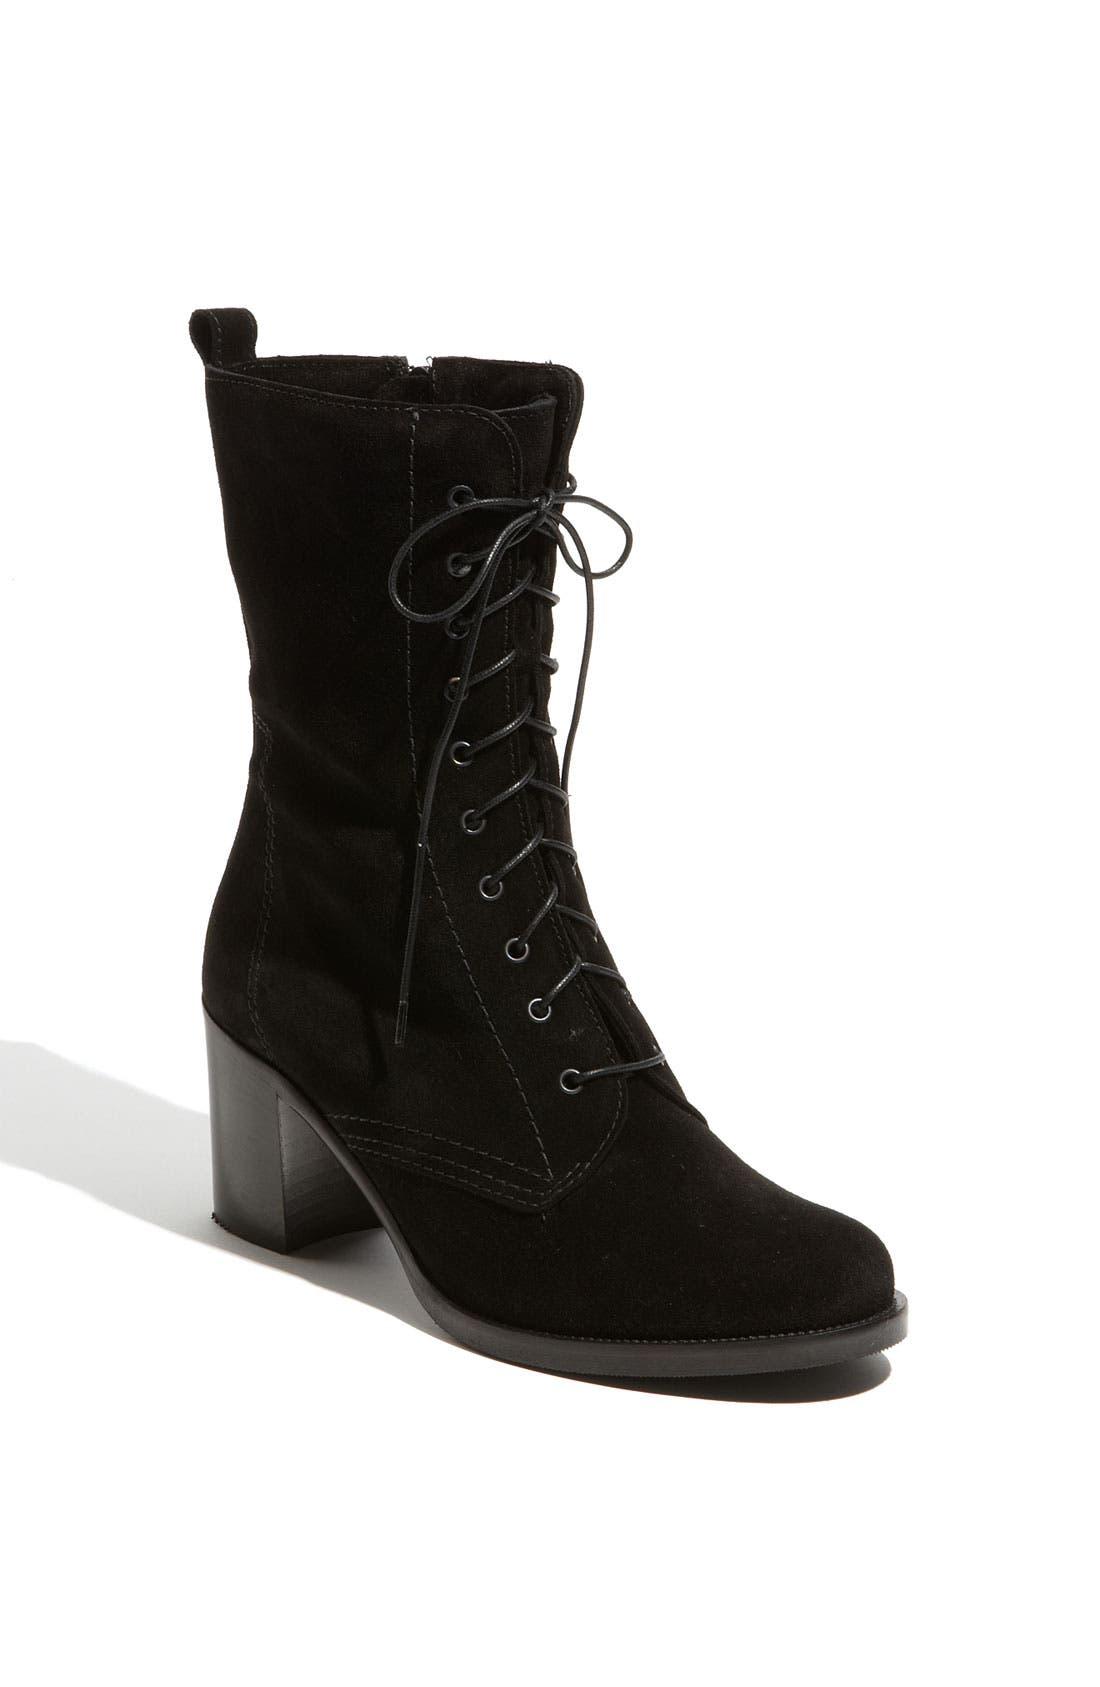 Alternate Image 1 Selected - La Canadienne 'Paula' Boot